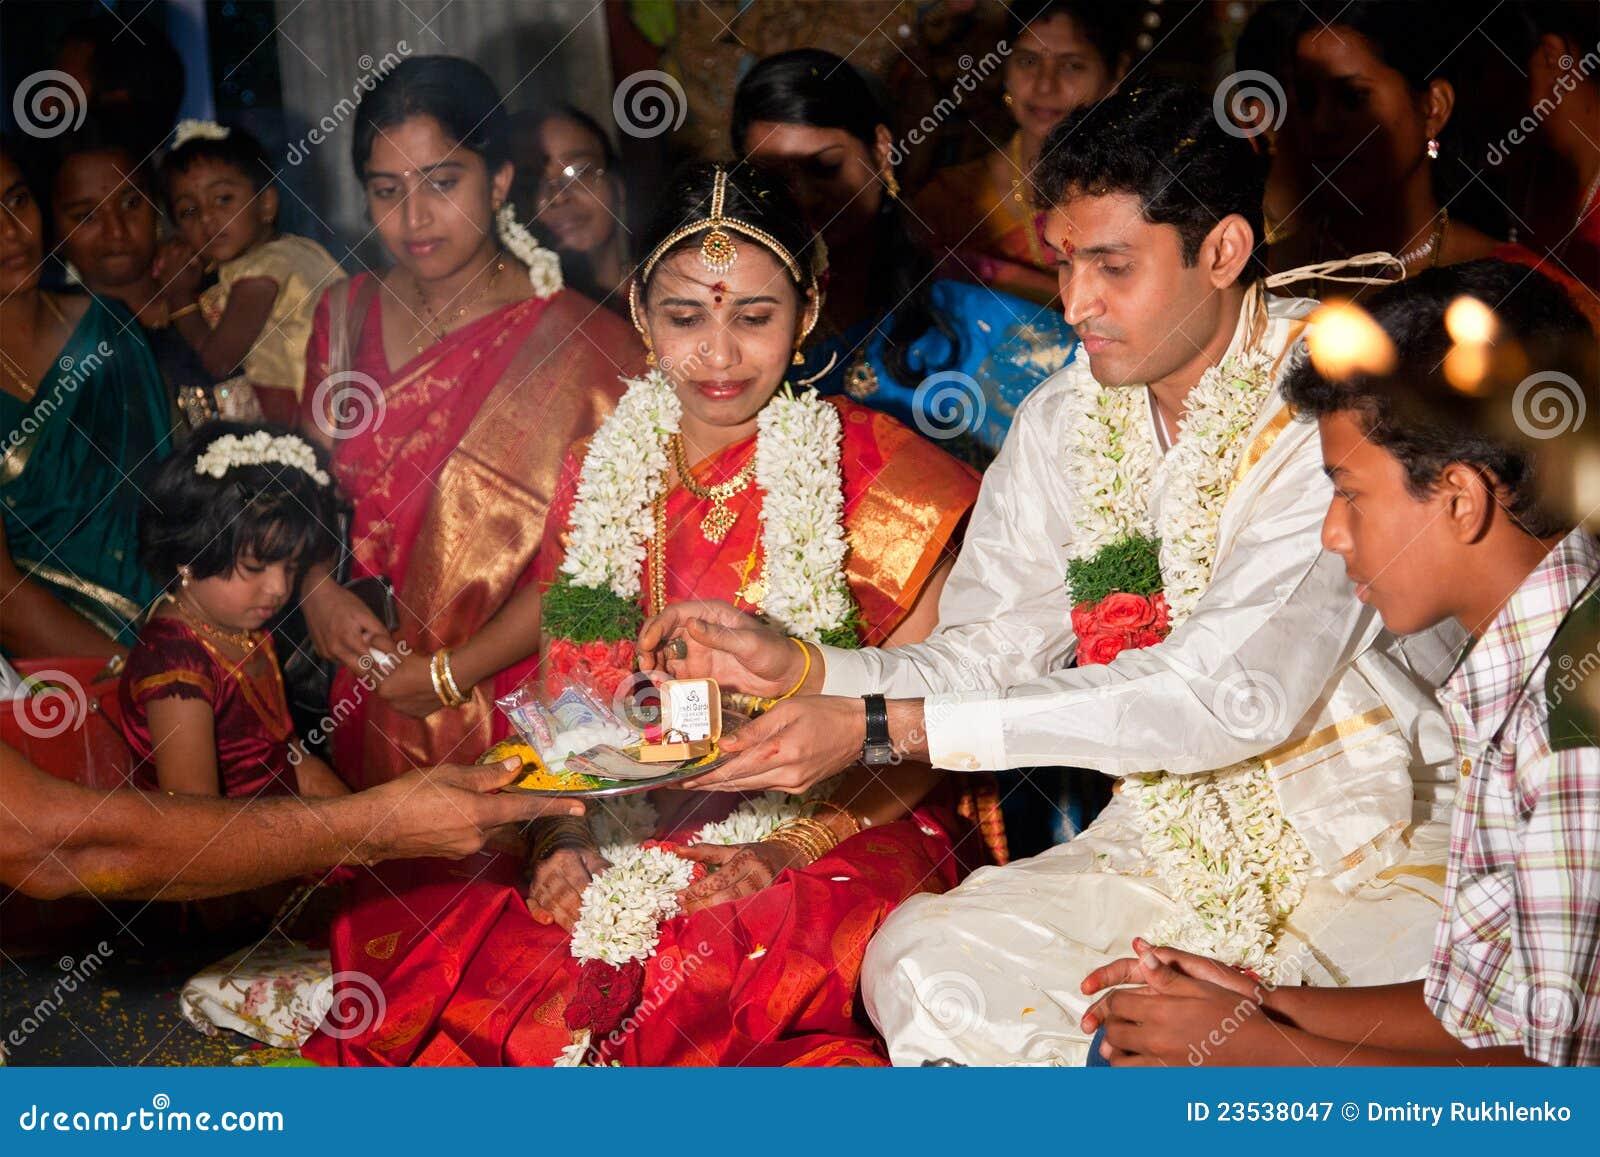 Cerremony Wedding traditionnel (Tamoul) indien